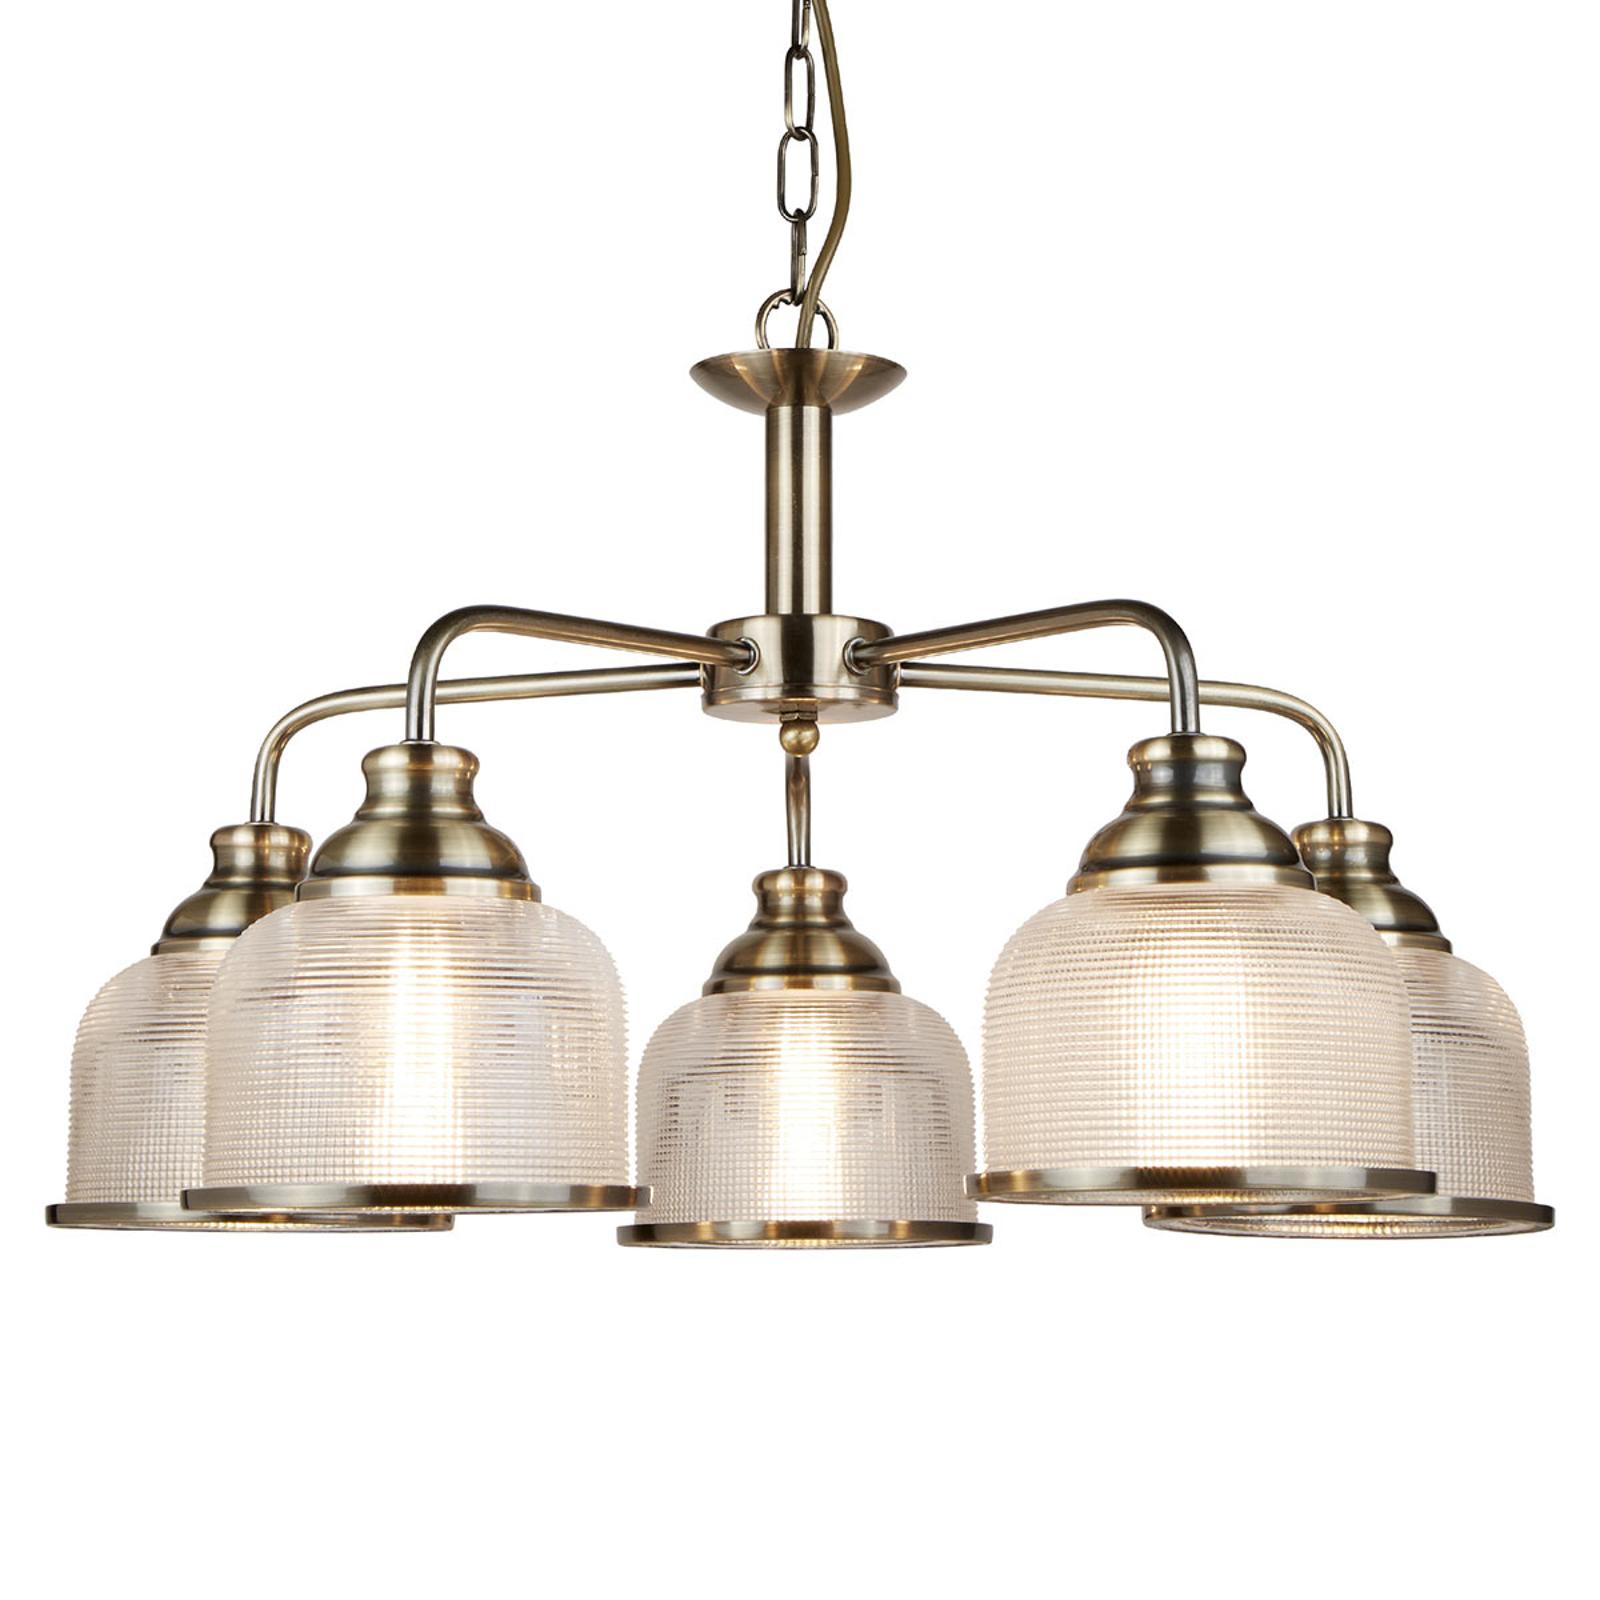 Suspension Bistro II plusieurs lampes vieux laiton